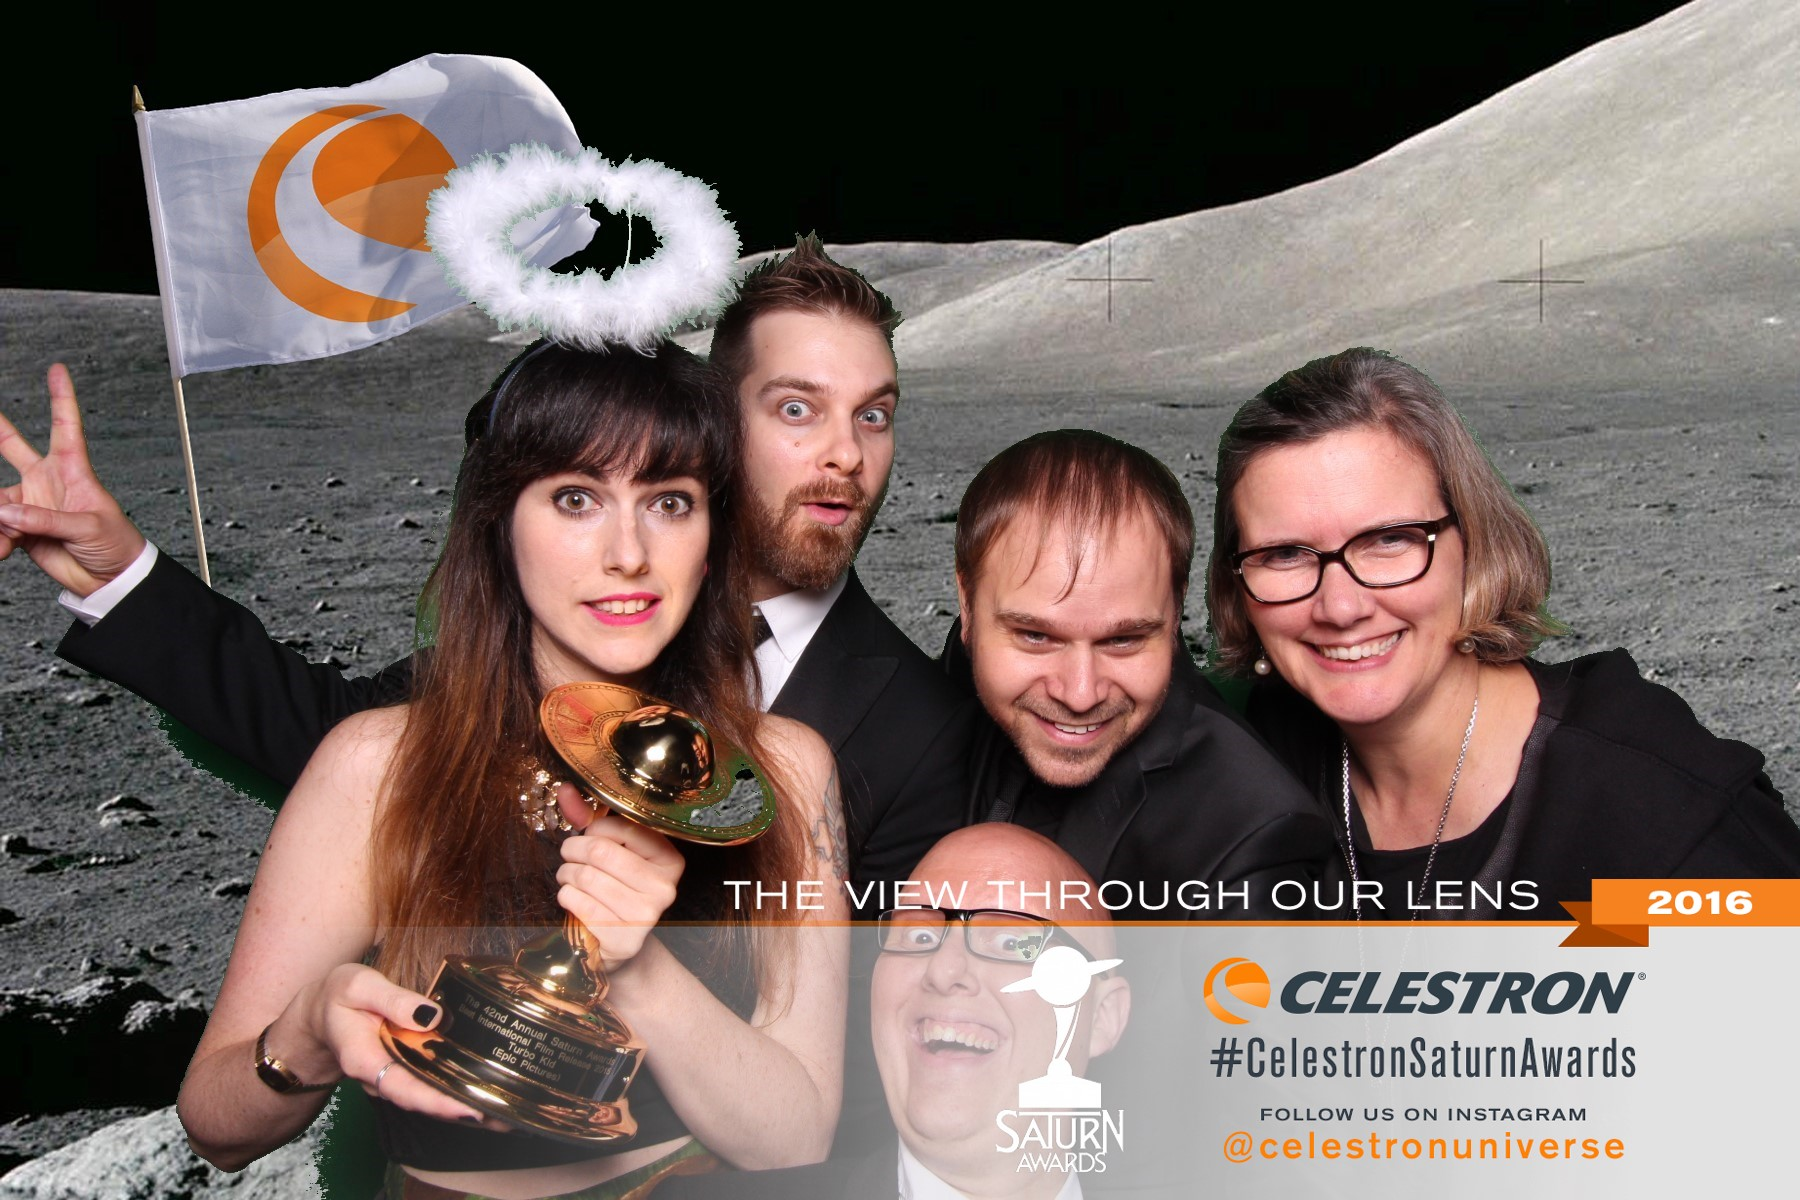 Celestron Saturn Awards